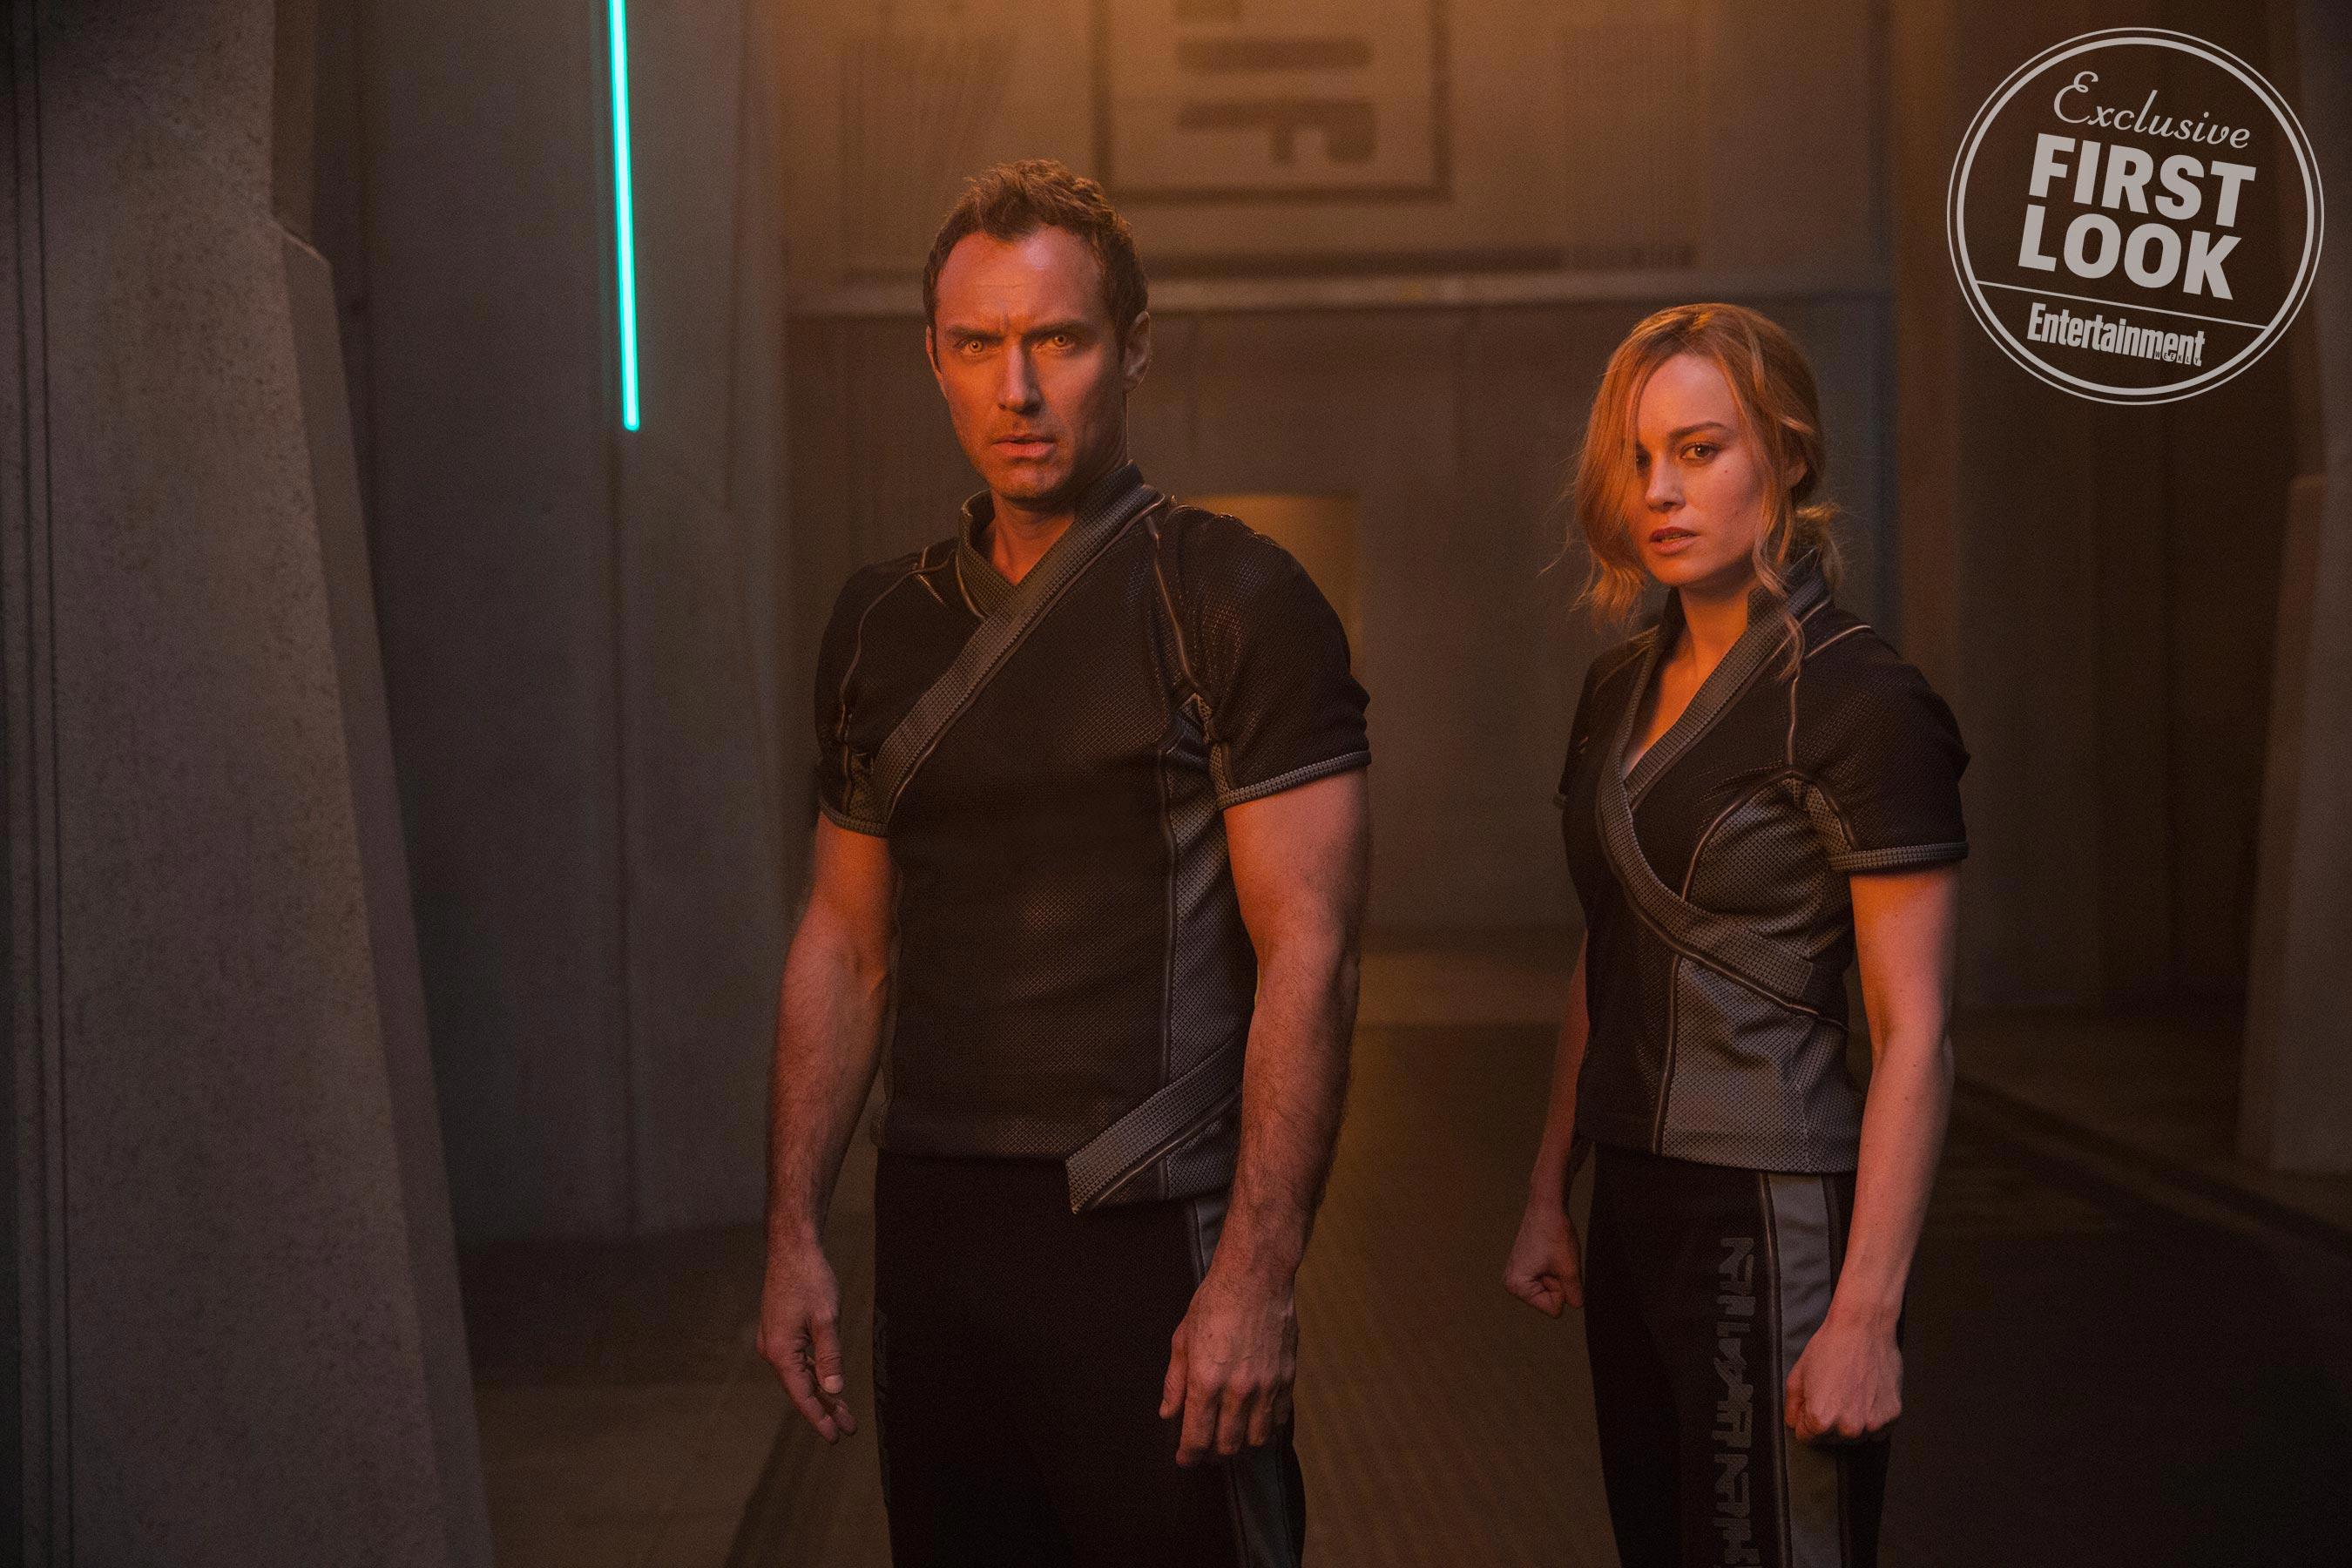 Captain Marvel Marvel Comics First Look Leader of Starforce (Jude Law) and Carol Danvers/Captain Marvel (Brie Larson)